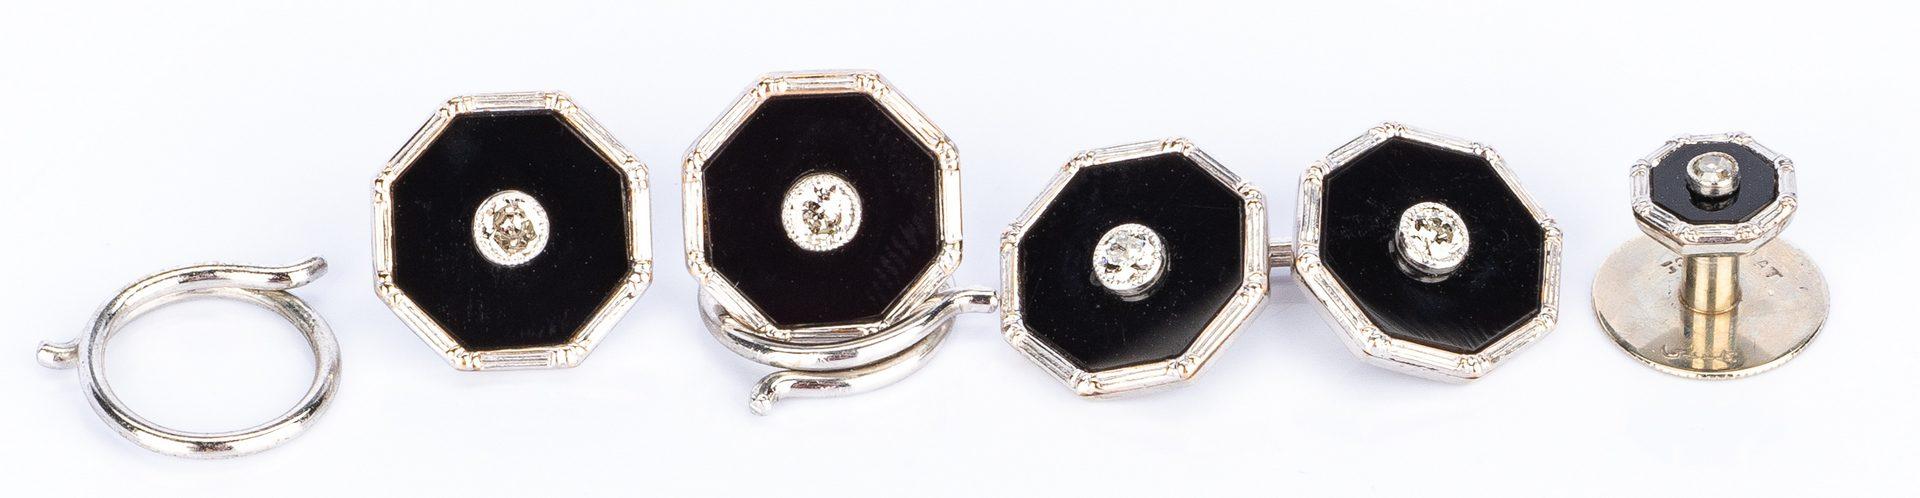 Lot 755: Boxed Tuxedo Set: Onyx & Diamond